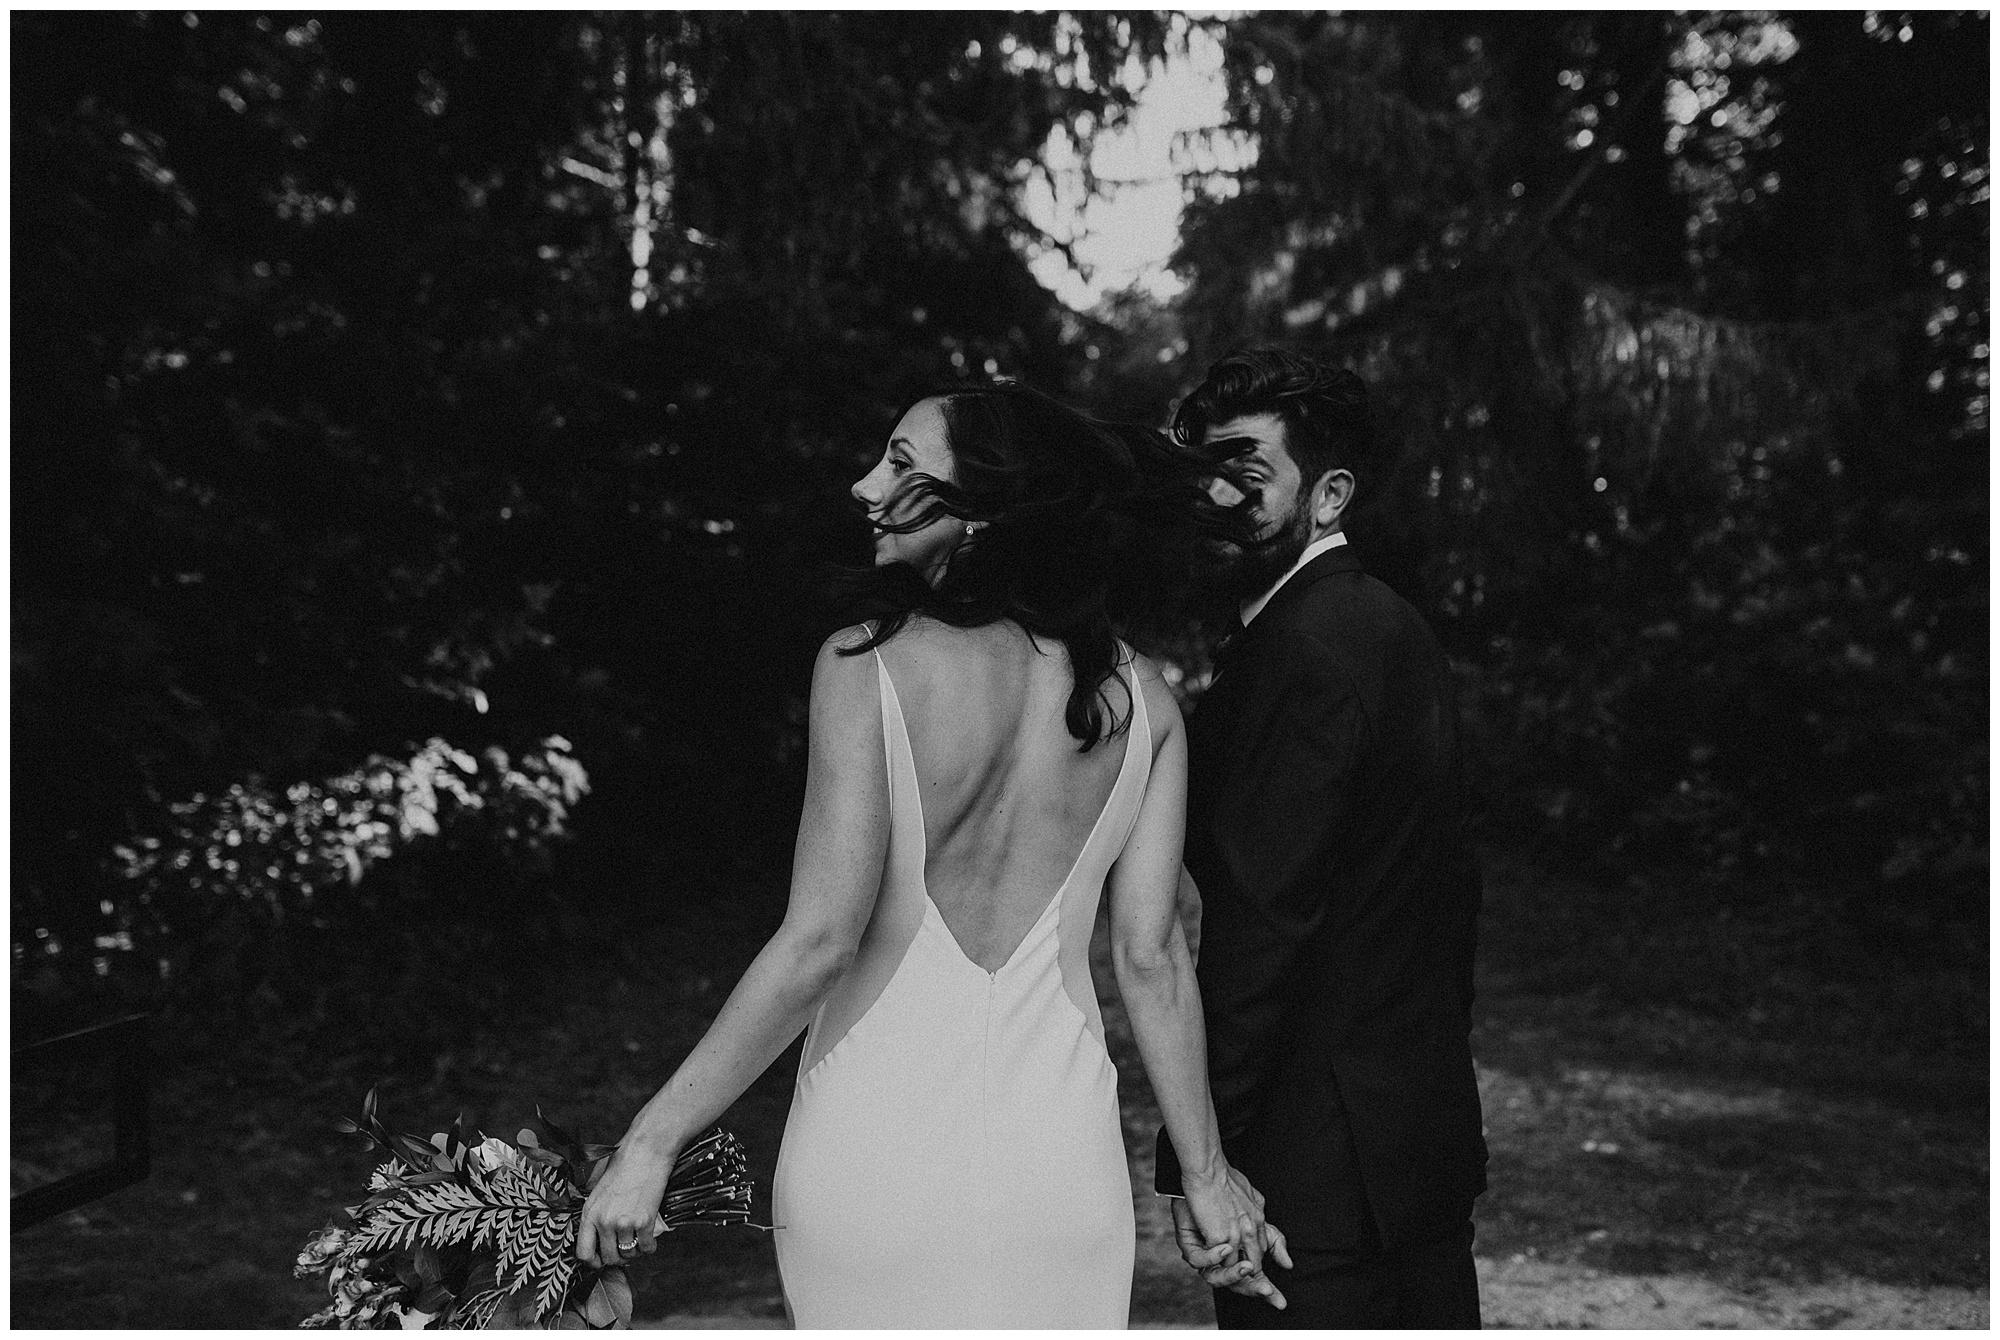 allerton_park_wedding_champaign_il_chicago_wright_photographs_ne_0091.jpg